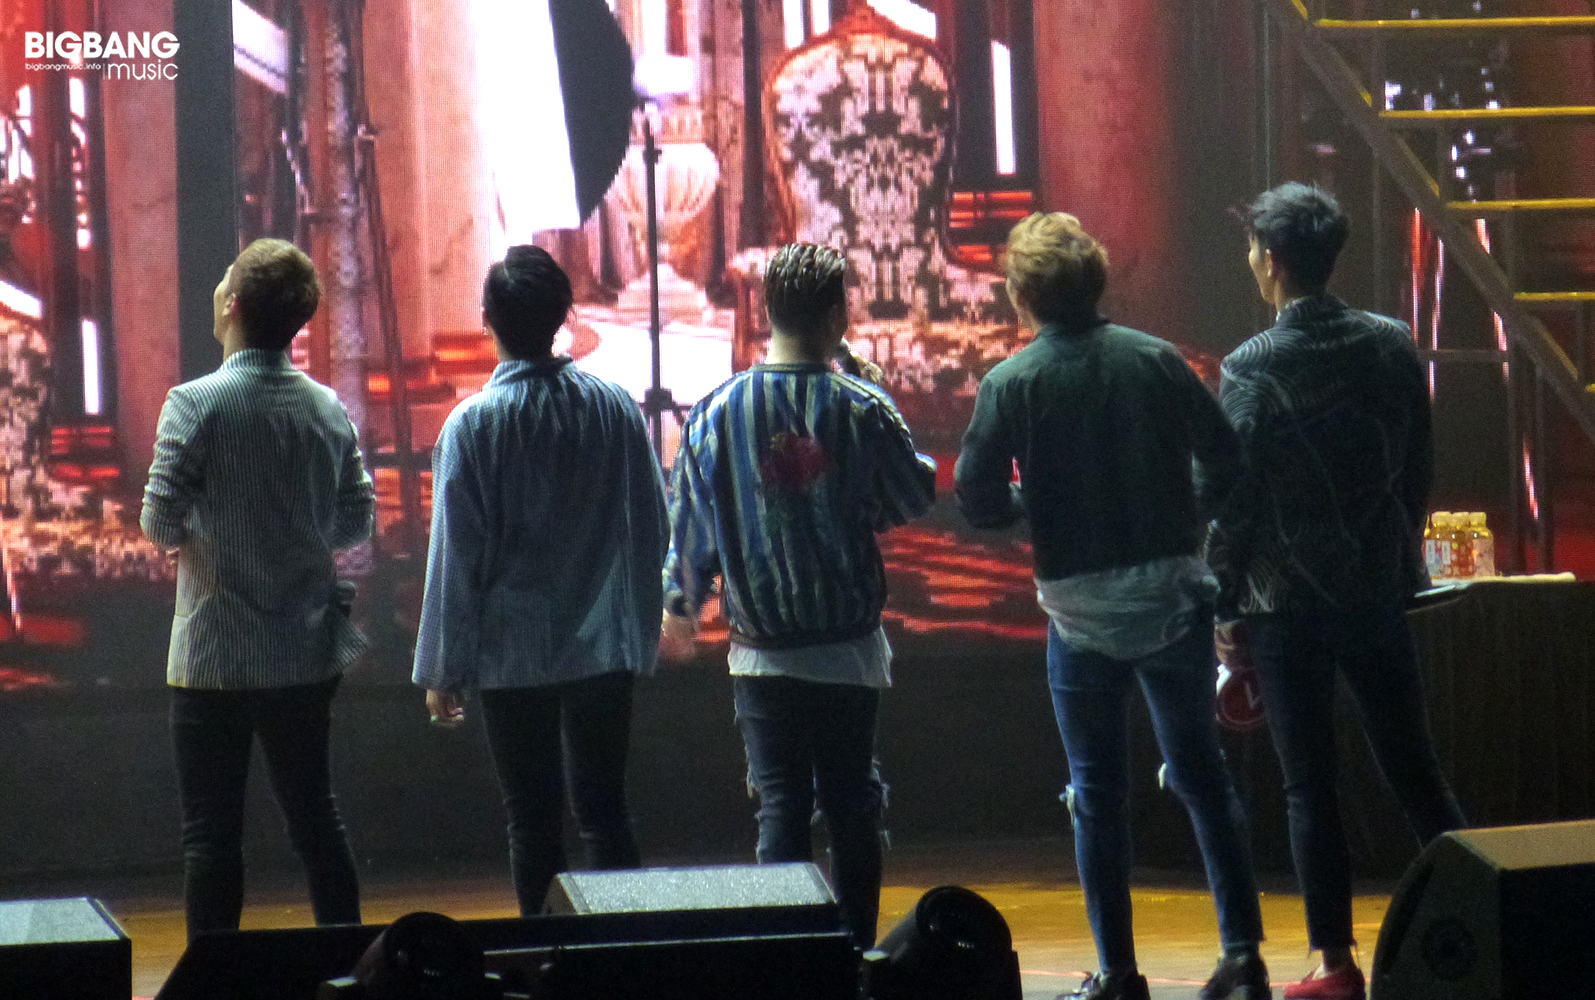 BBMusic-BIGBANG_FM_Beijing_Day3_2016-07-17_20